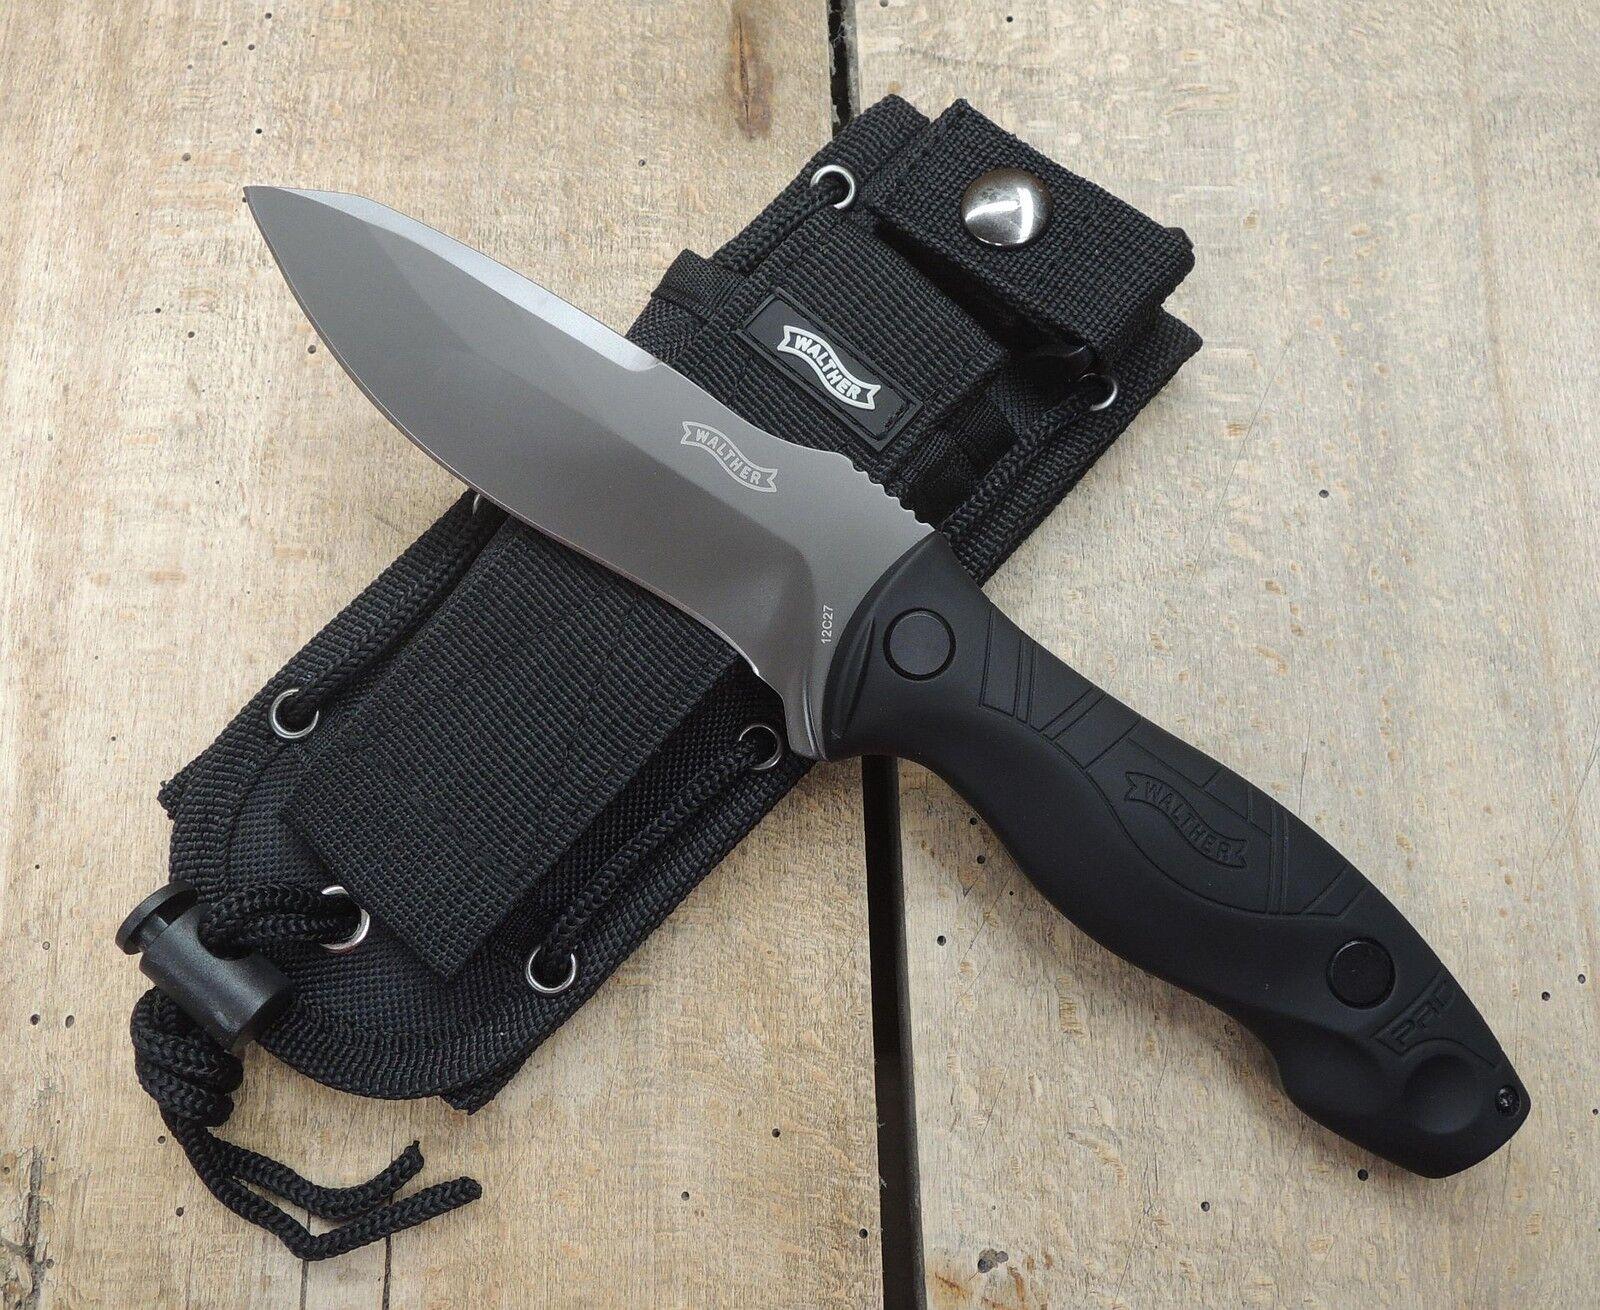 Walther Pro FBK FBK FBK Messer Fixed Blade Knife 12C27 Sandvik Stahl G10 Griff + Scheide b3ac9d